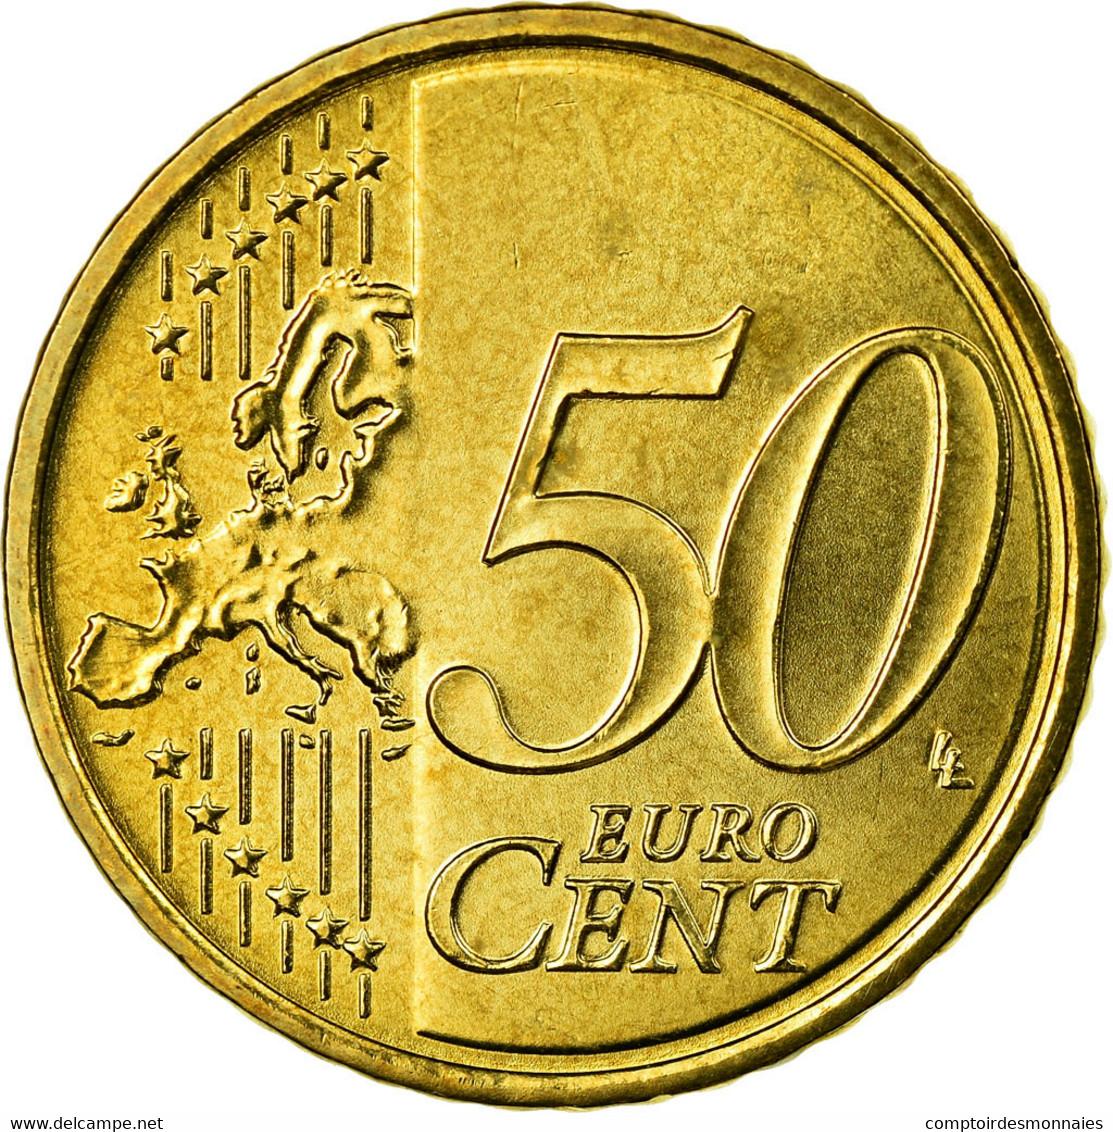 Autriche, 50 Euro Cent, 2008, SPL, Laiton, KM:3141 - Autriche